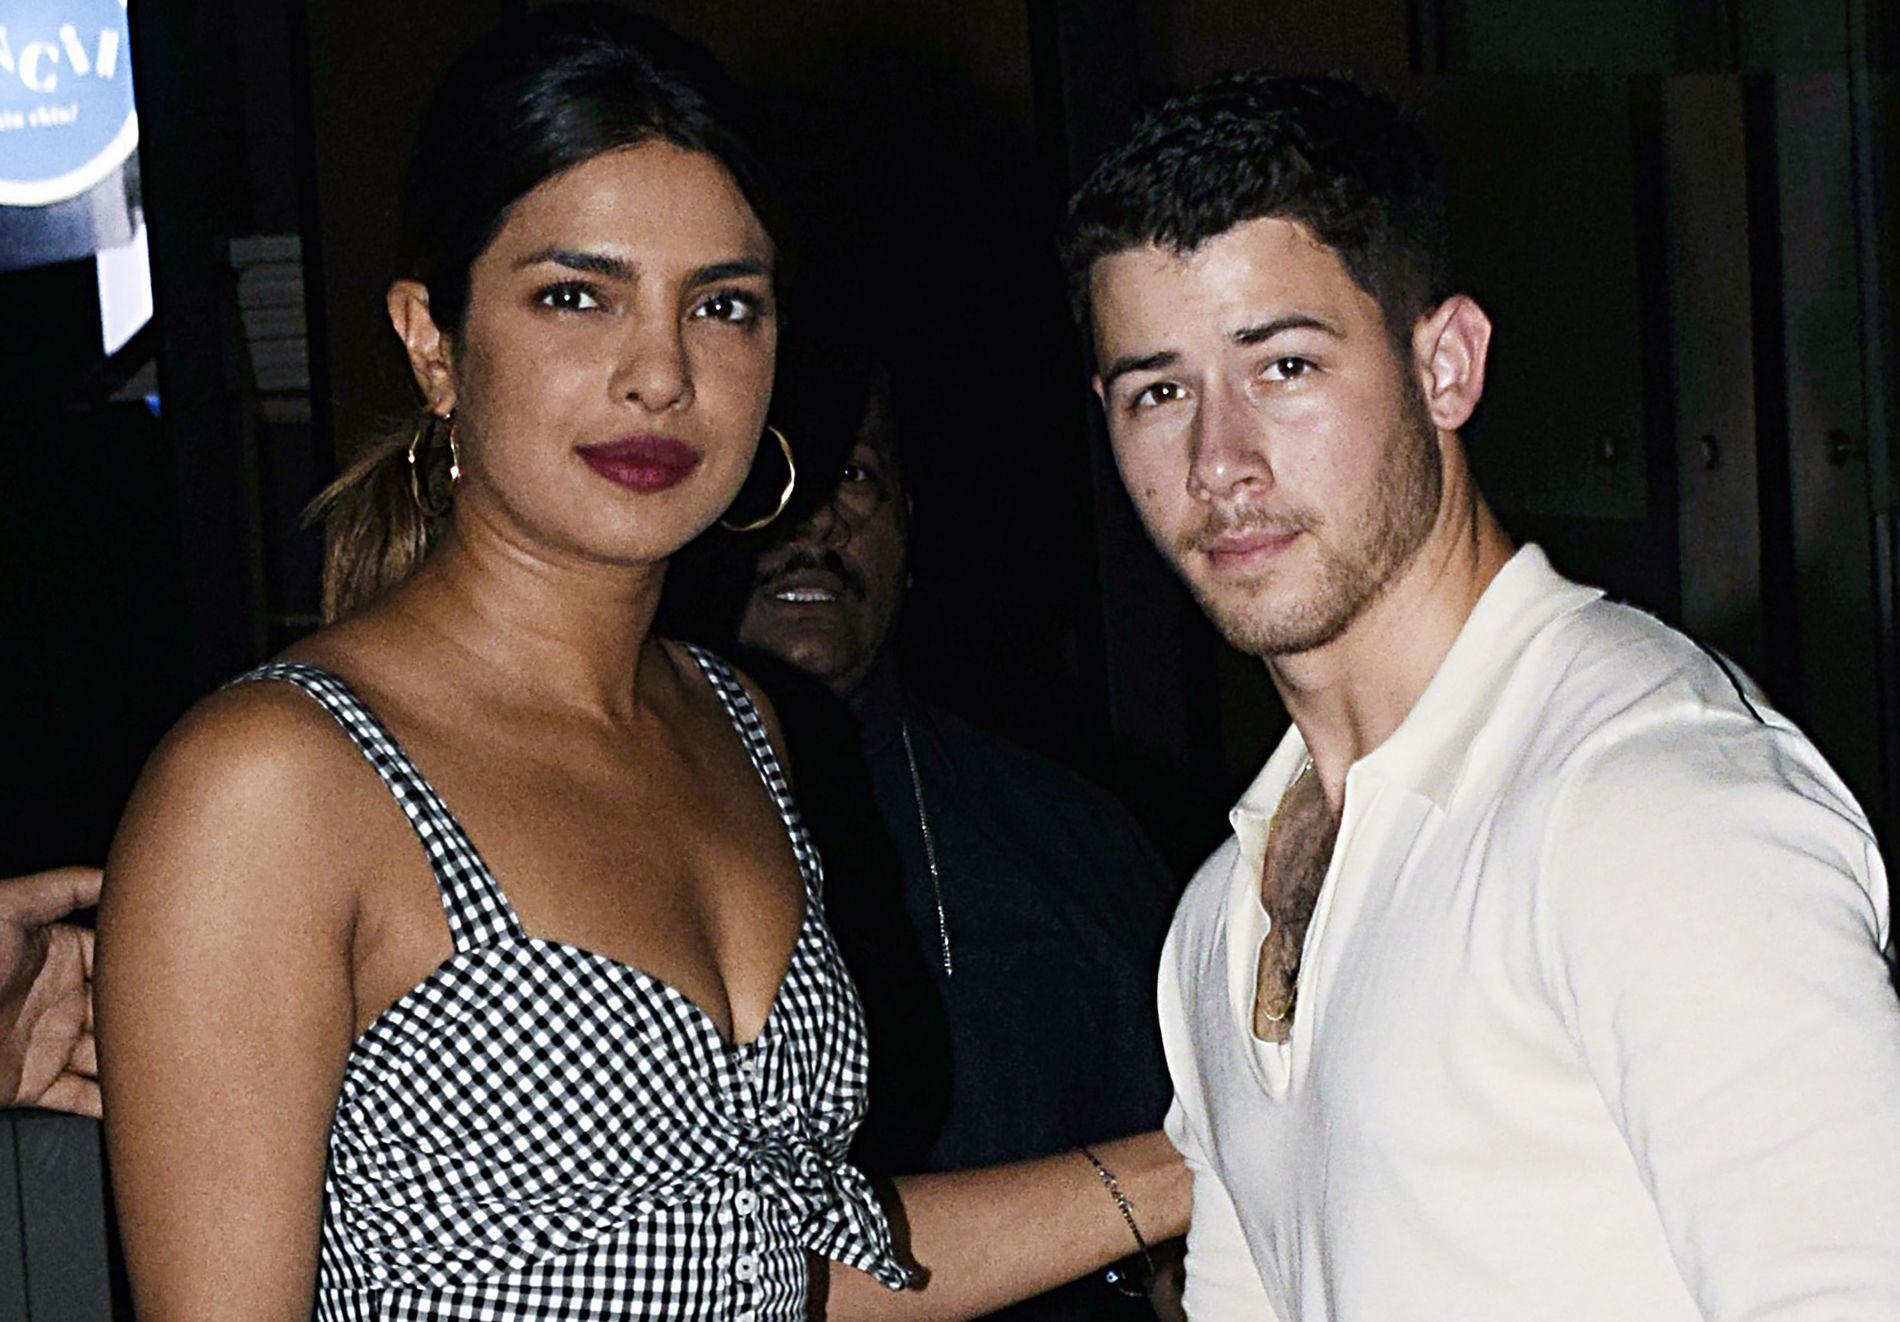 VIRVELVIND-ROMANSE: Priyanka Chopra og Nick Jonas avbildet i Mumbai i sommer.